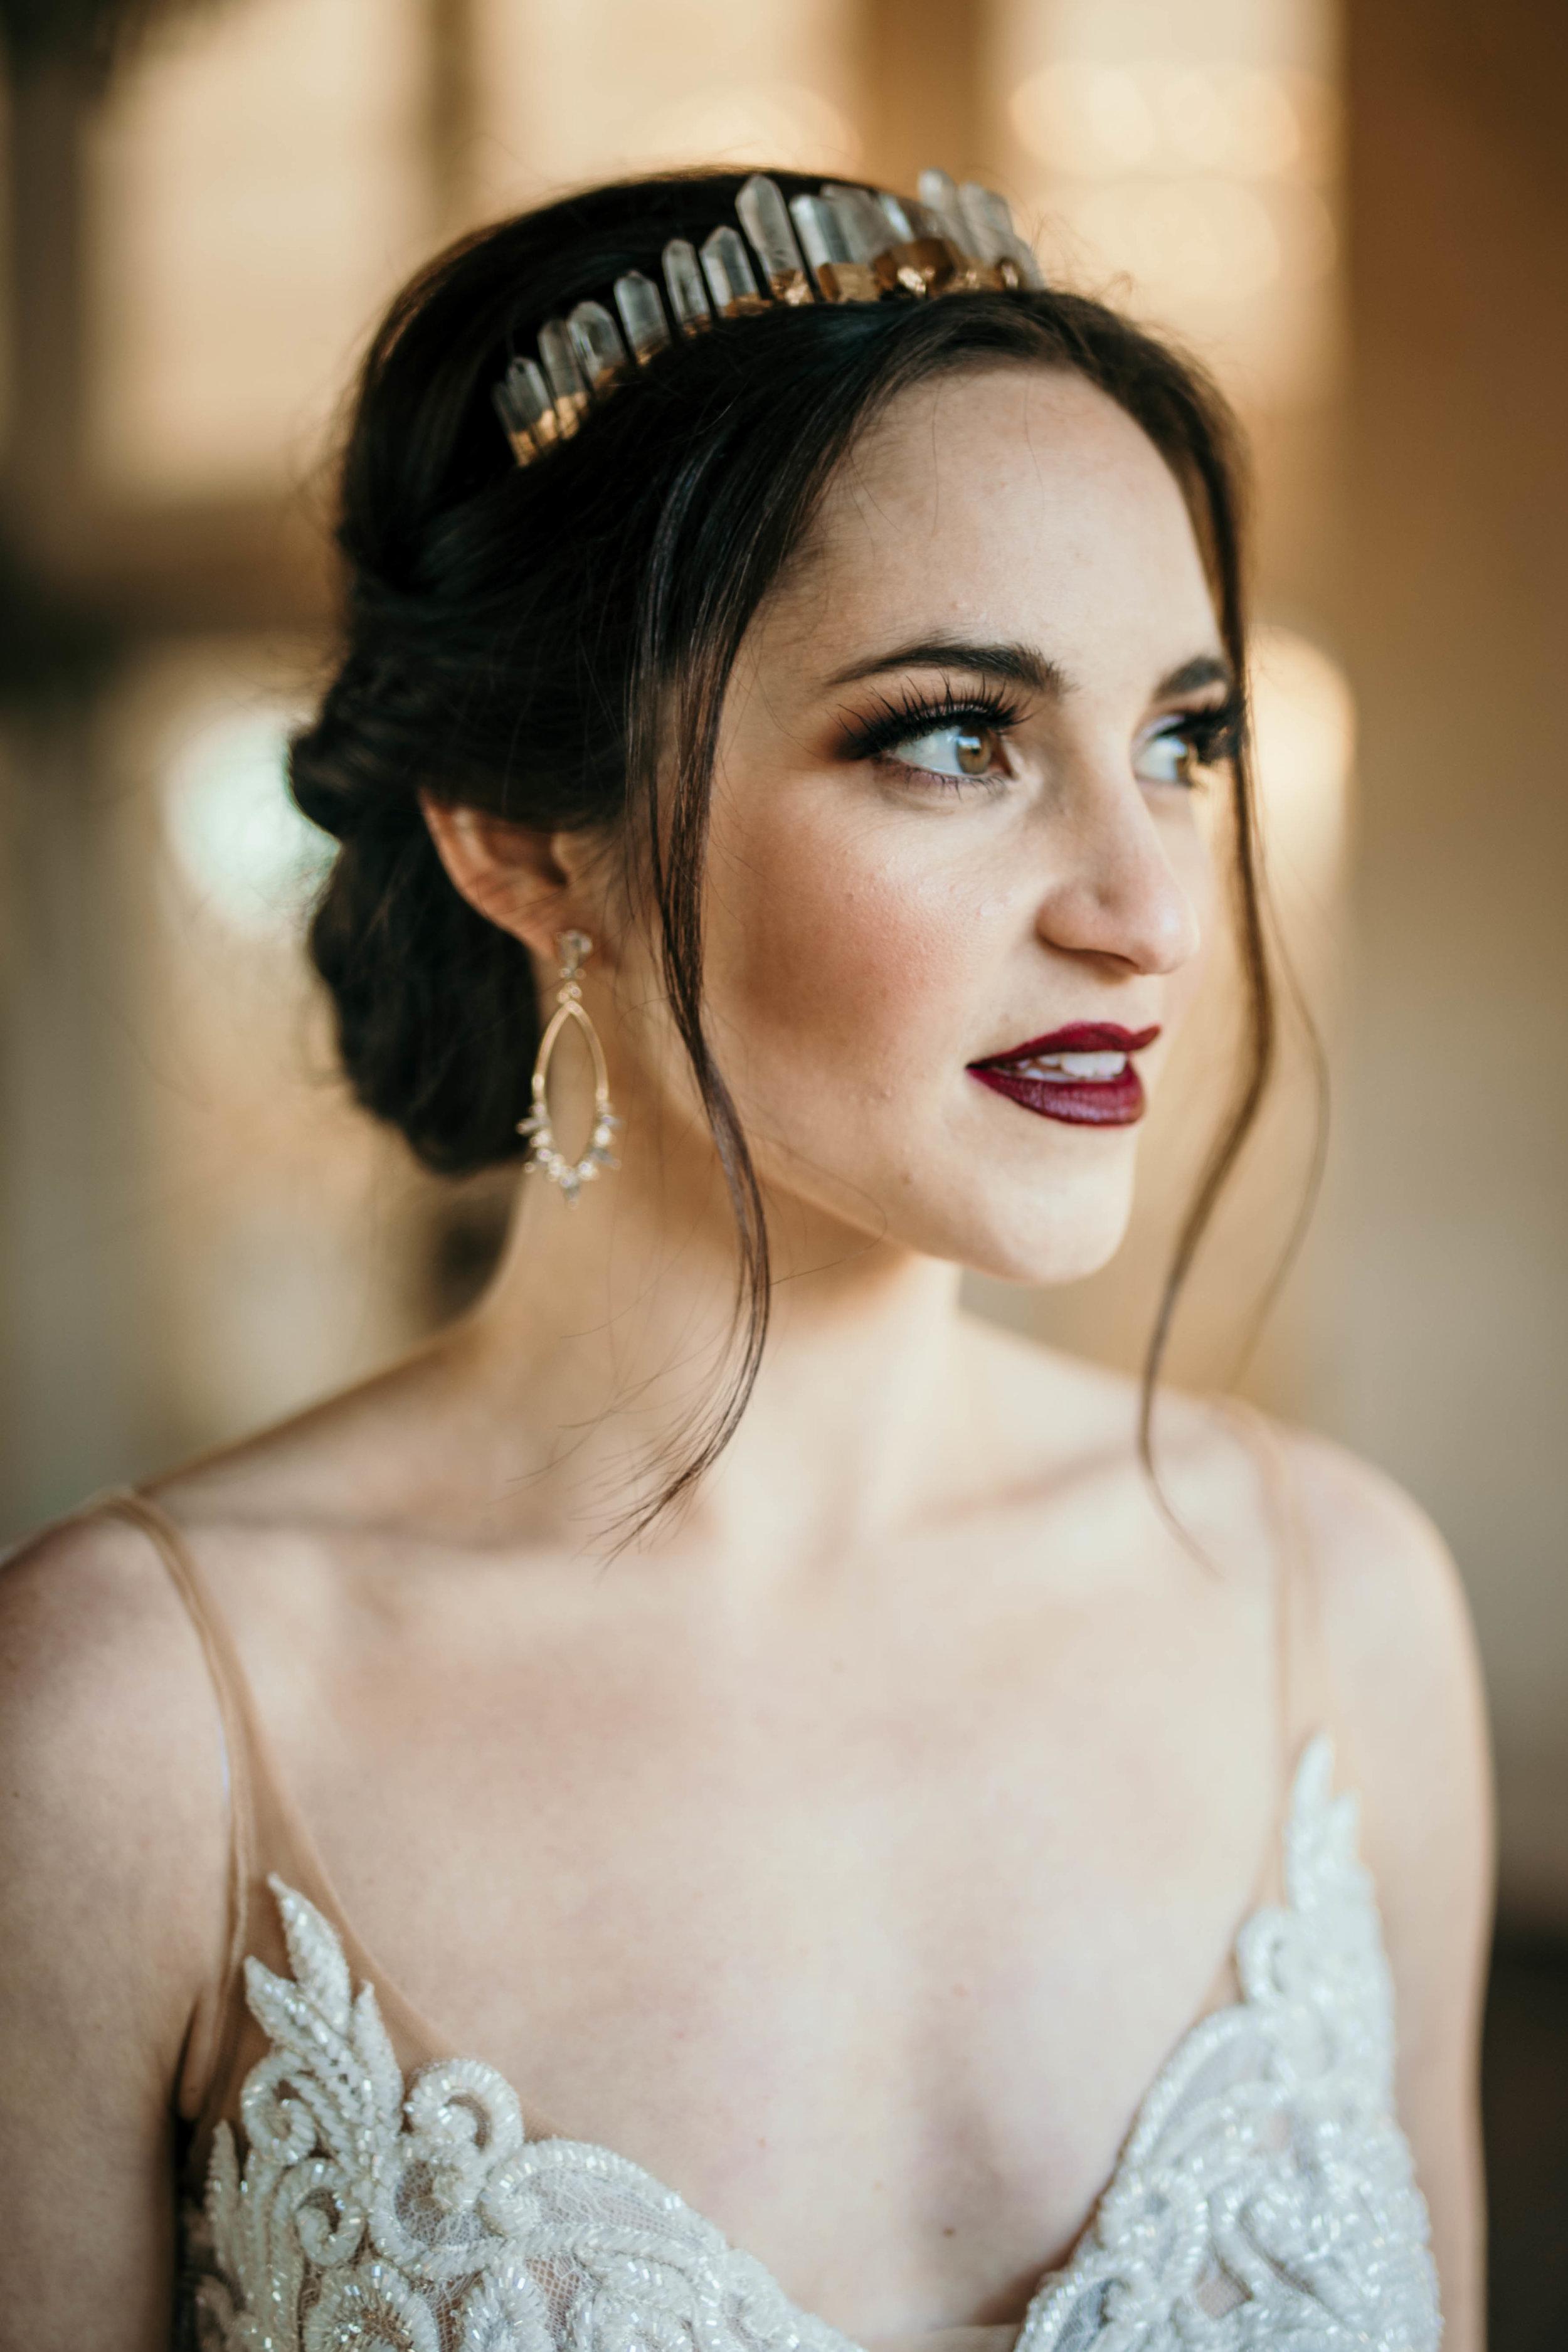 Austin Wedding Videographer - Dolls for Dolls (309 of 323).jpg